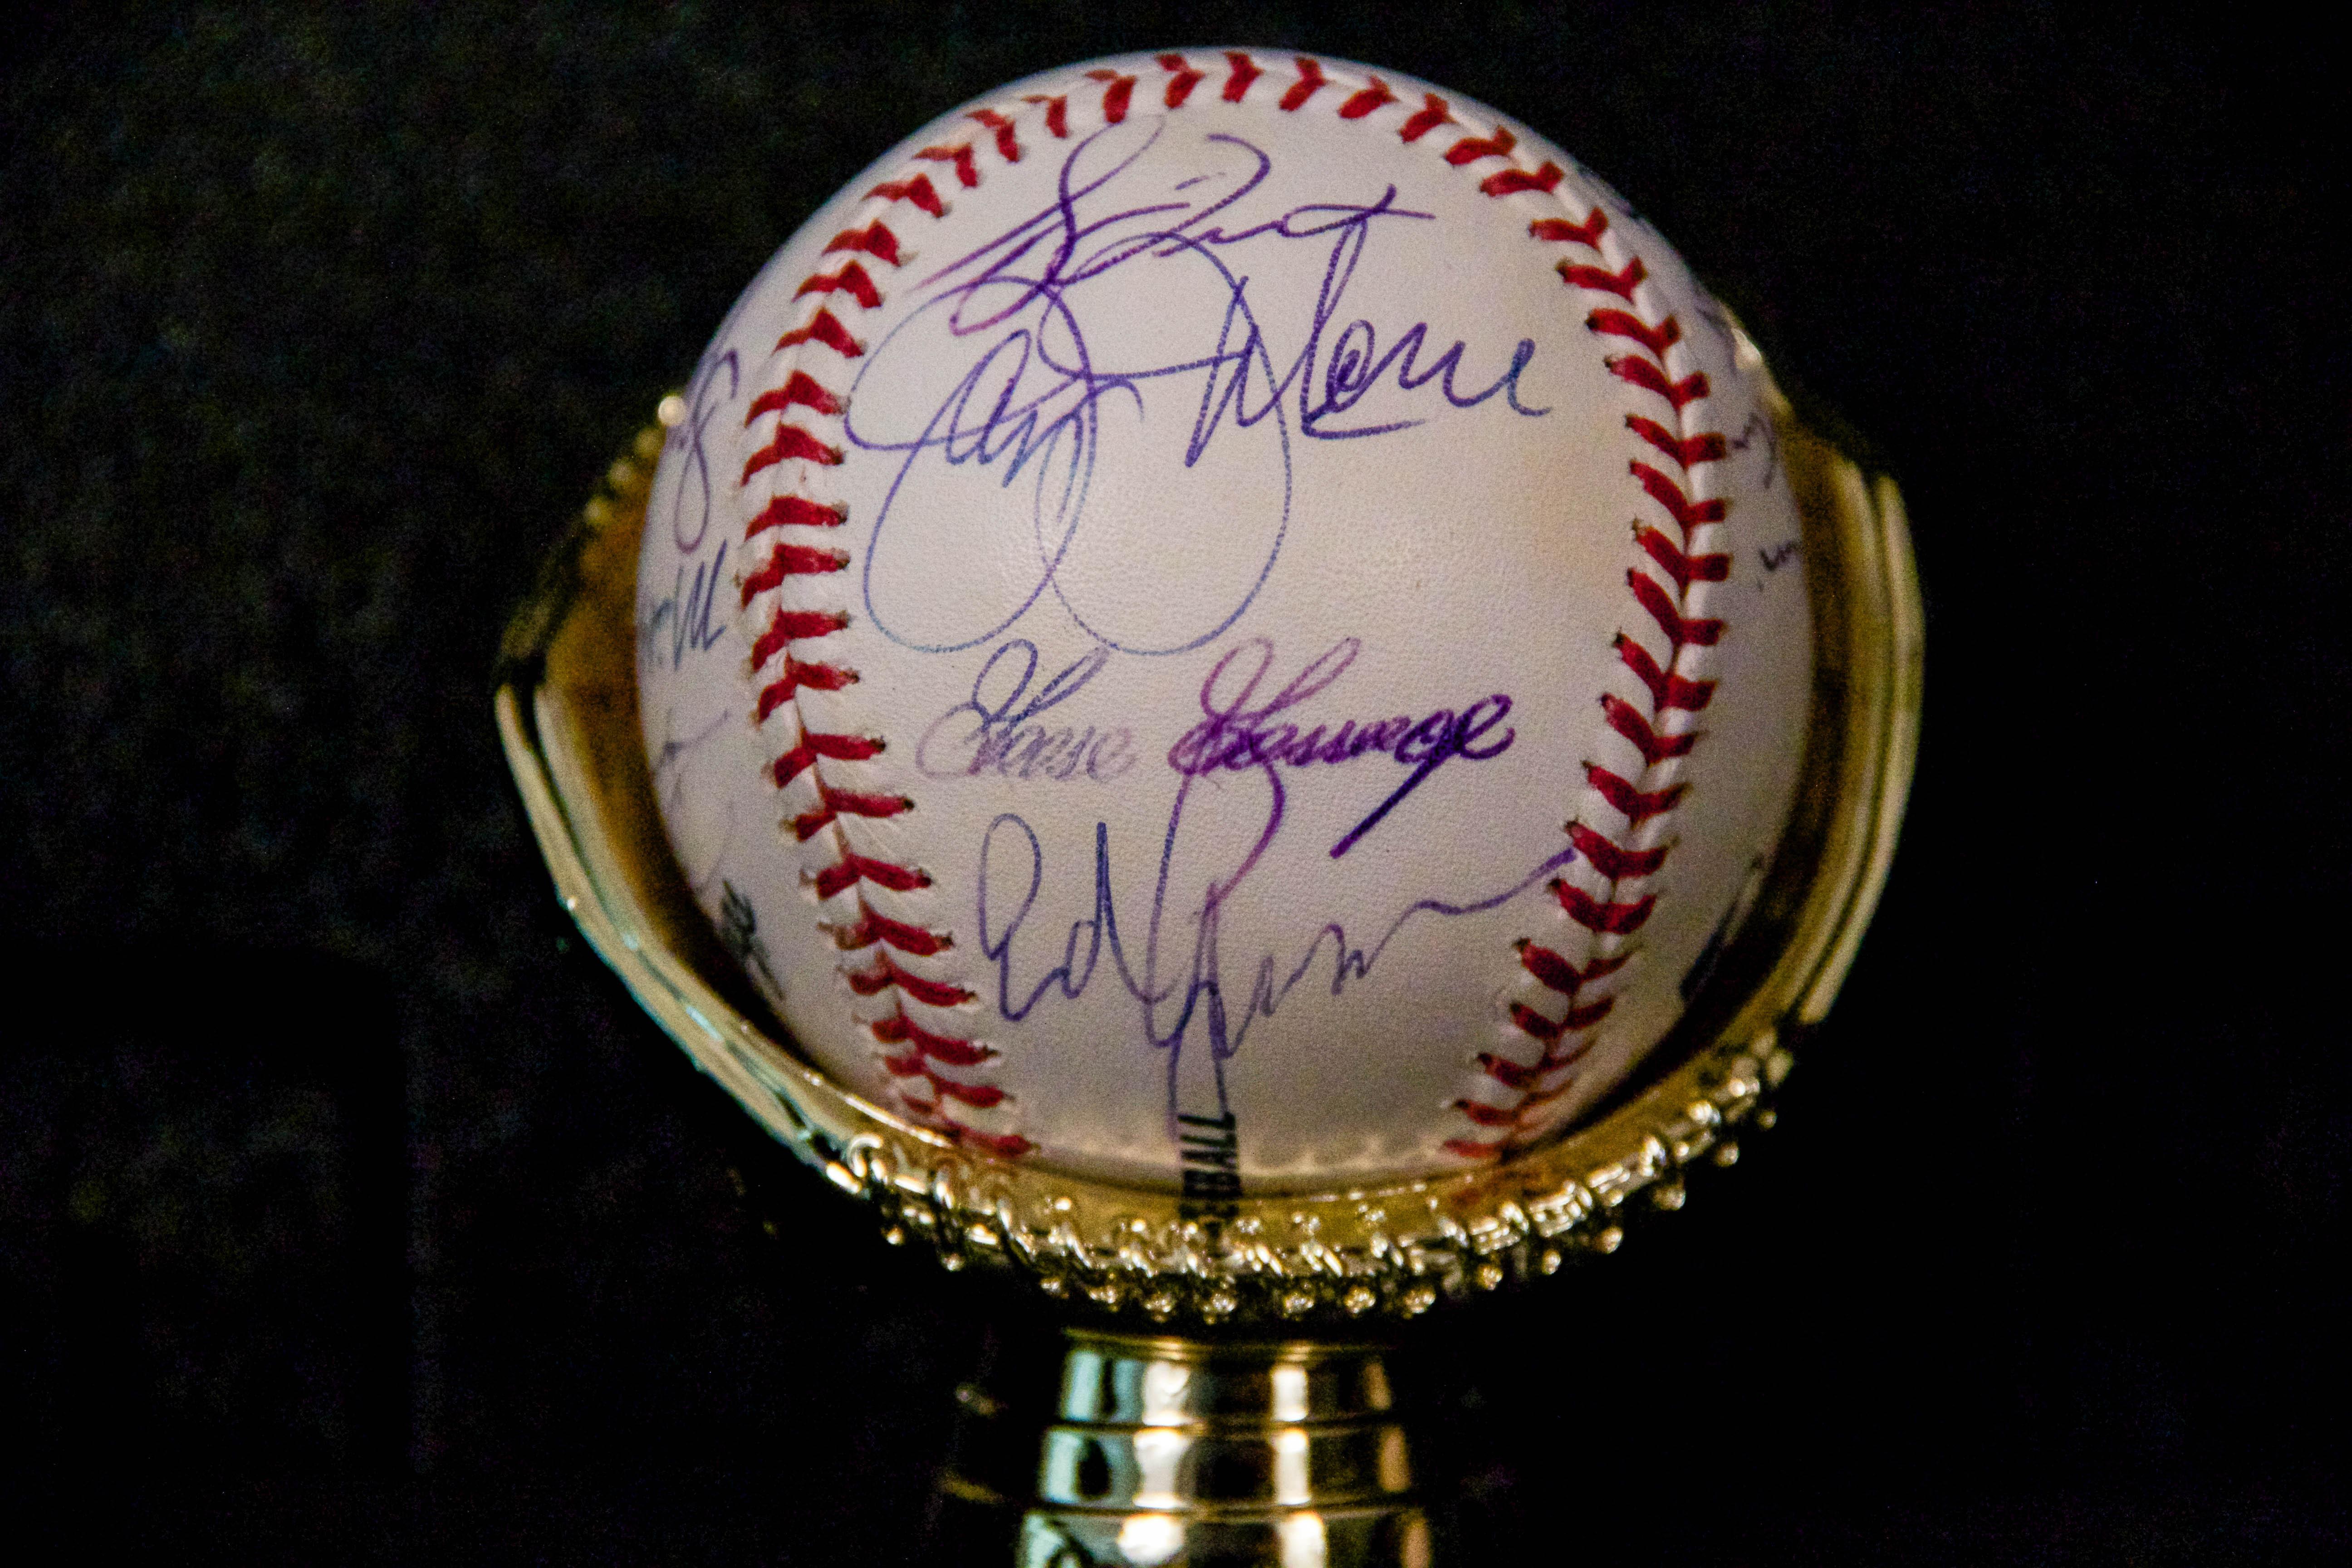 1978 World Series Champions